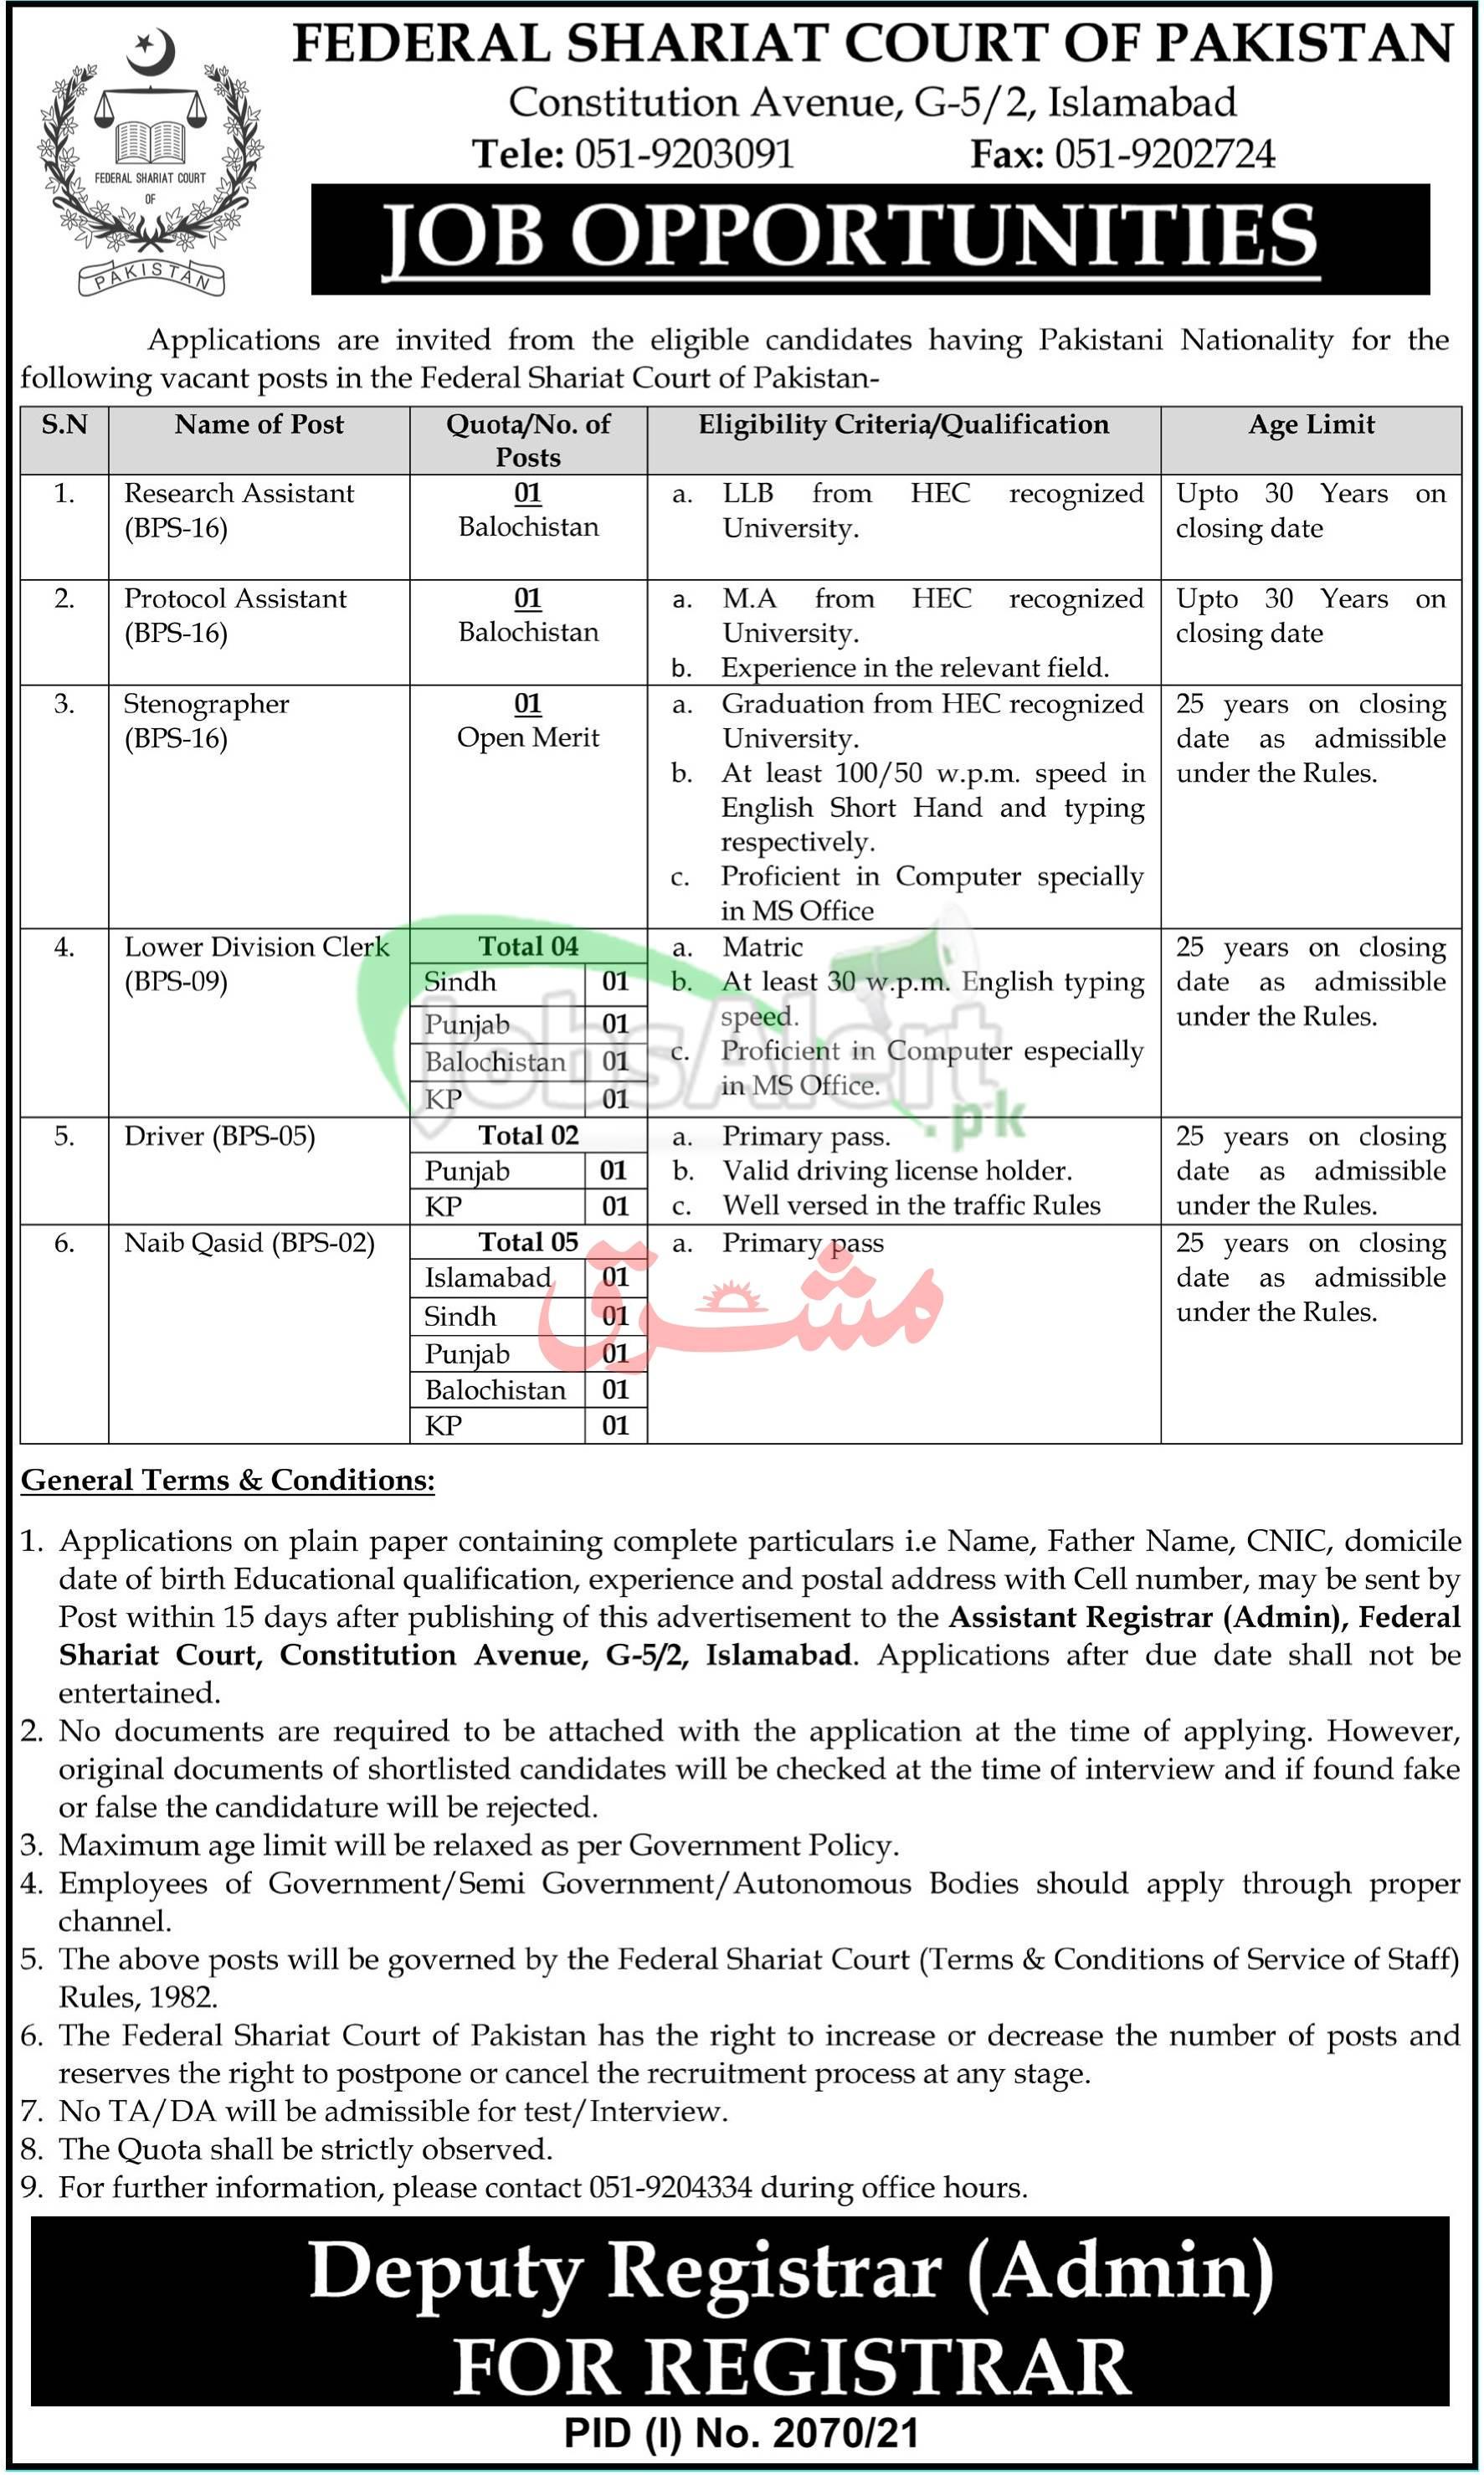 Federal Shariat Court of Pakistan Jobs